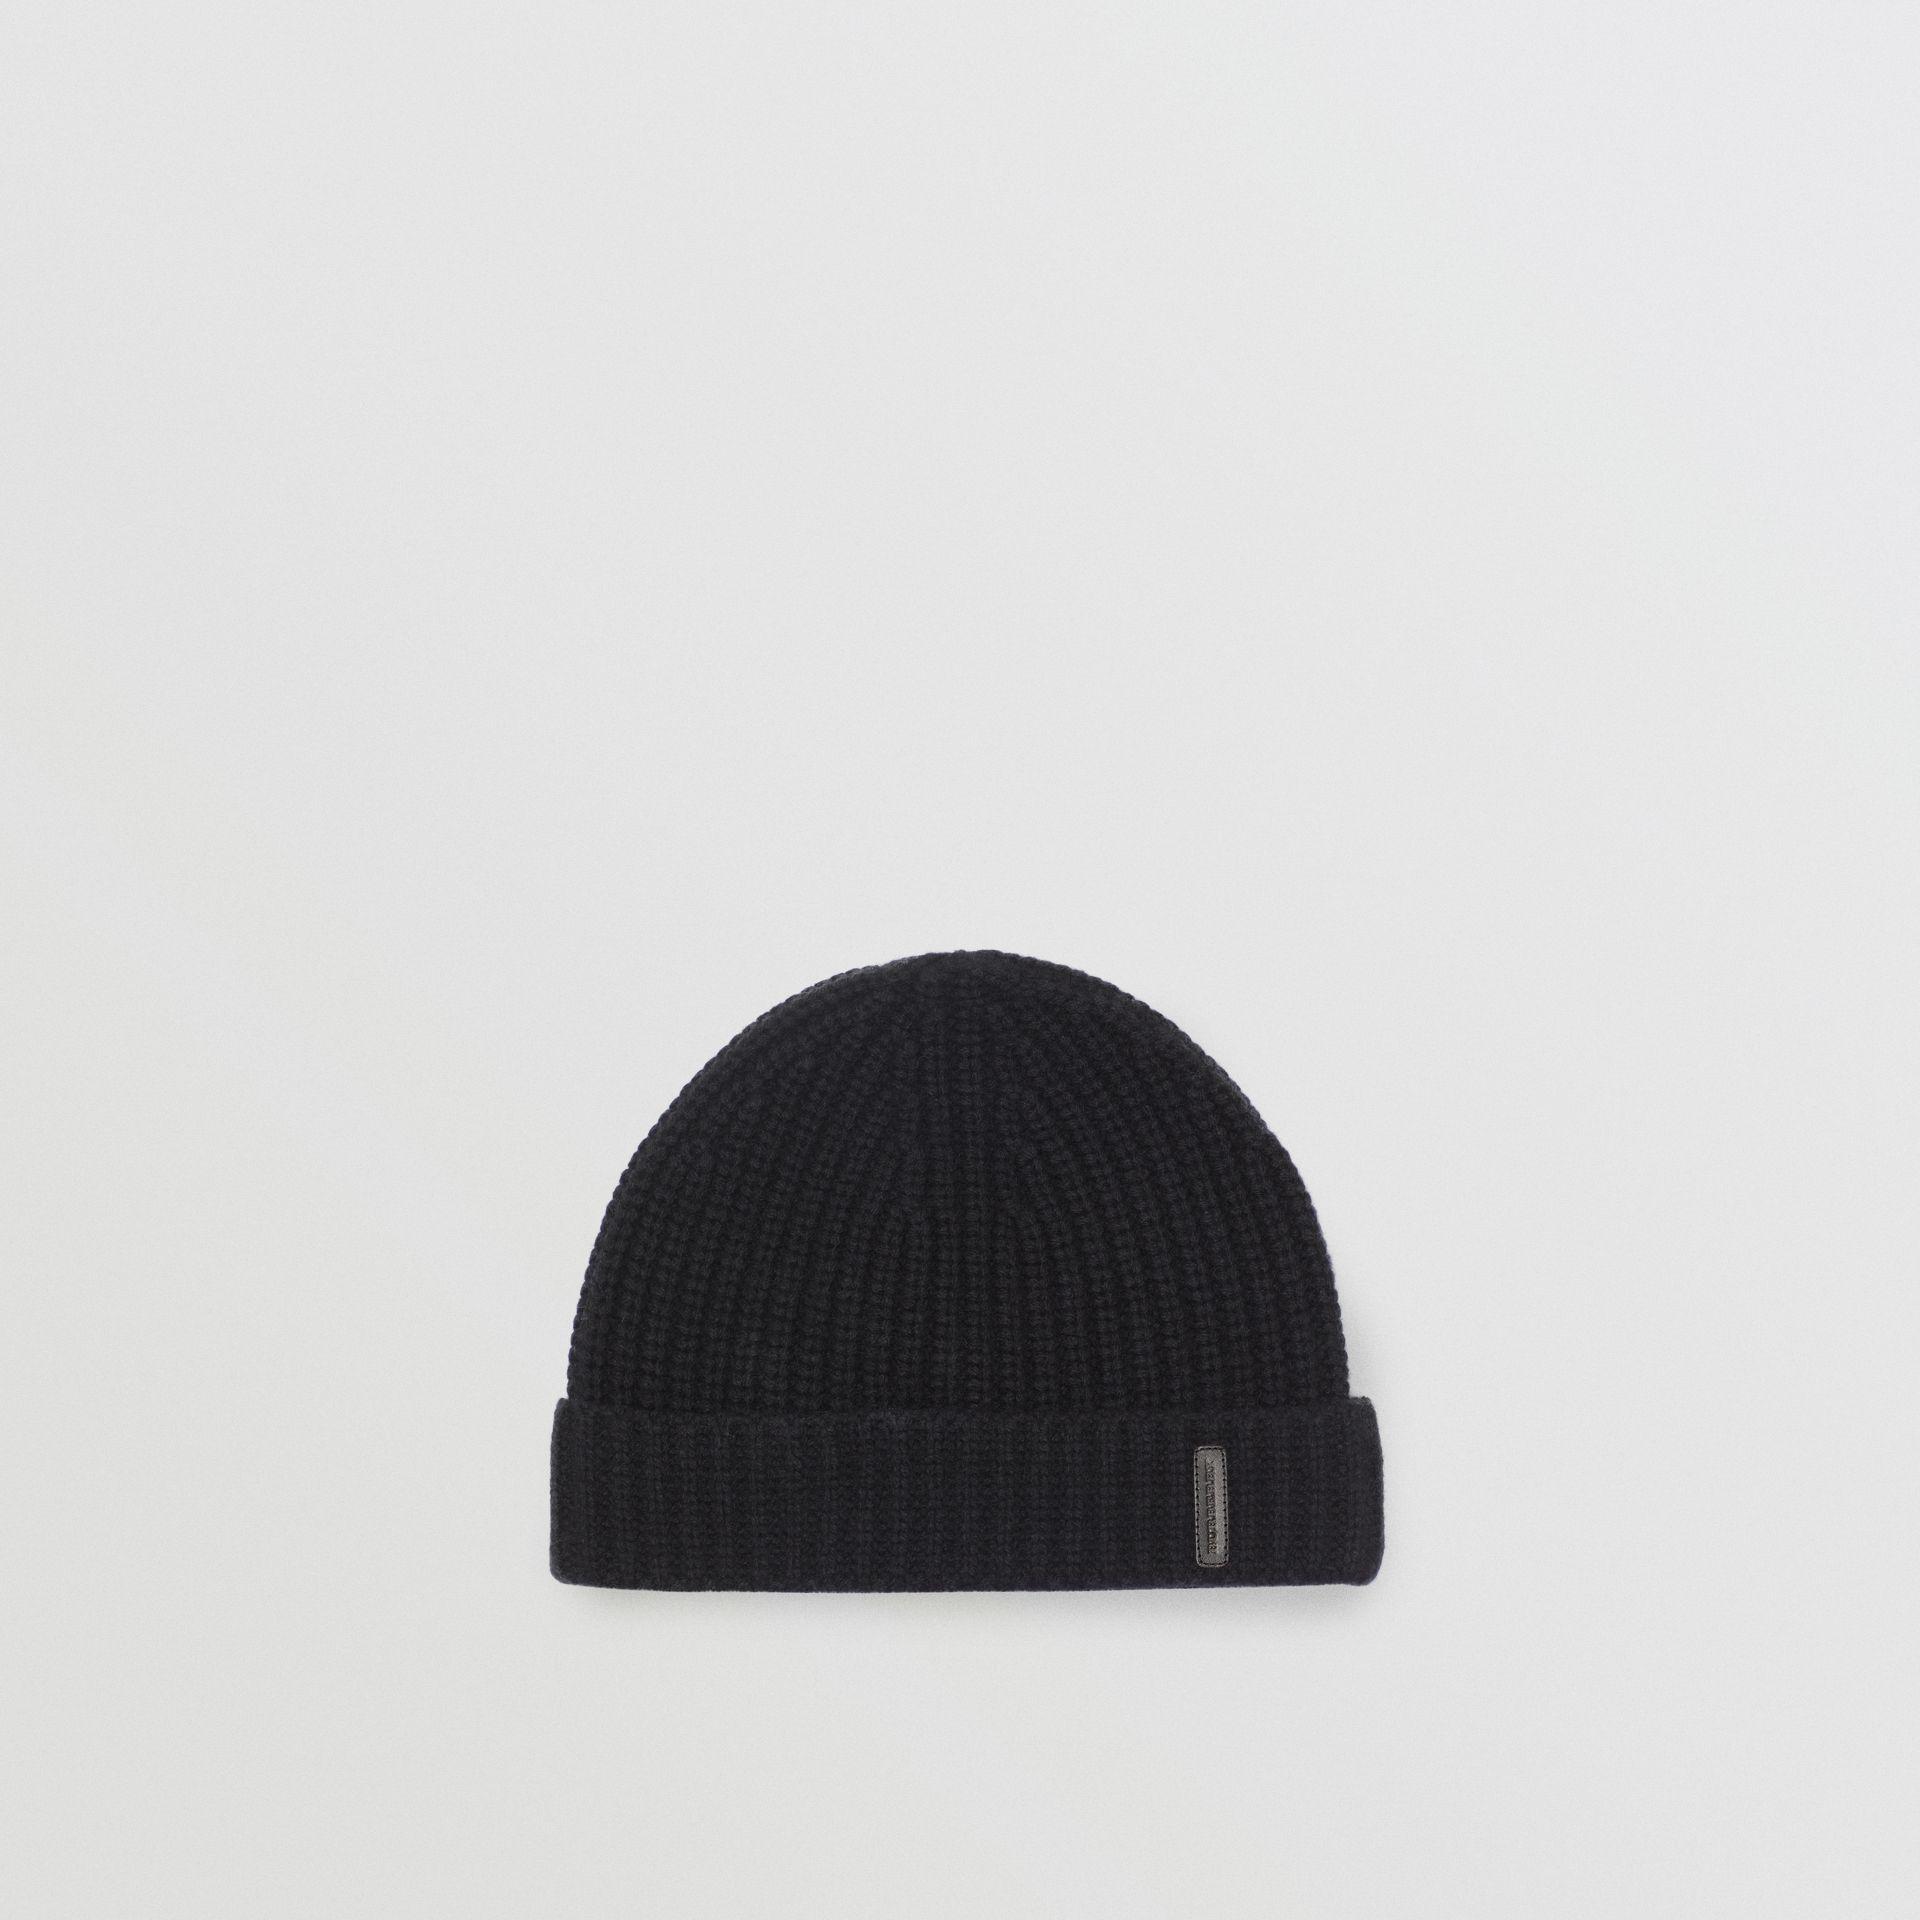 d51fc78a6a275 Burberry Rib Knit Cashmere Beanie In Black